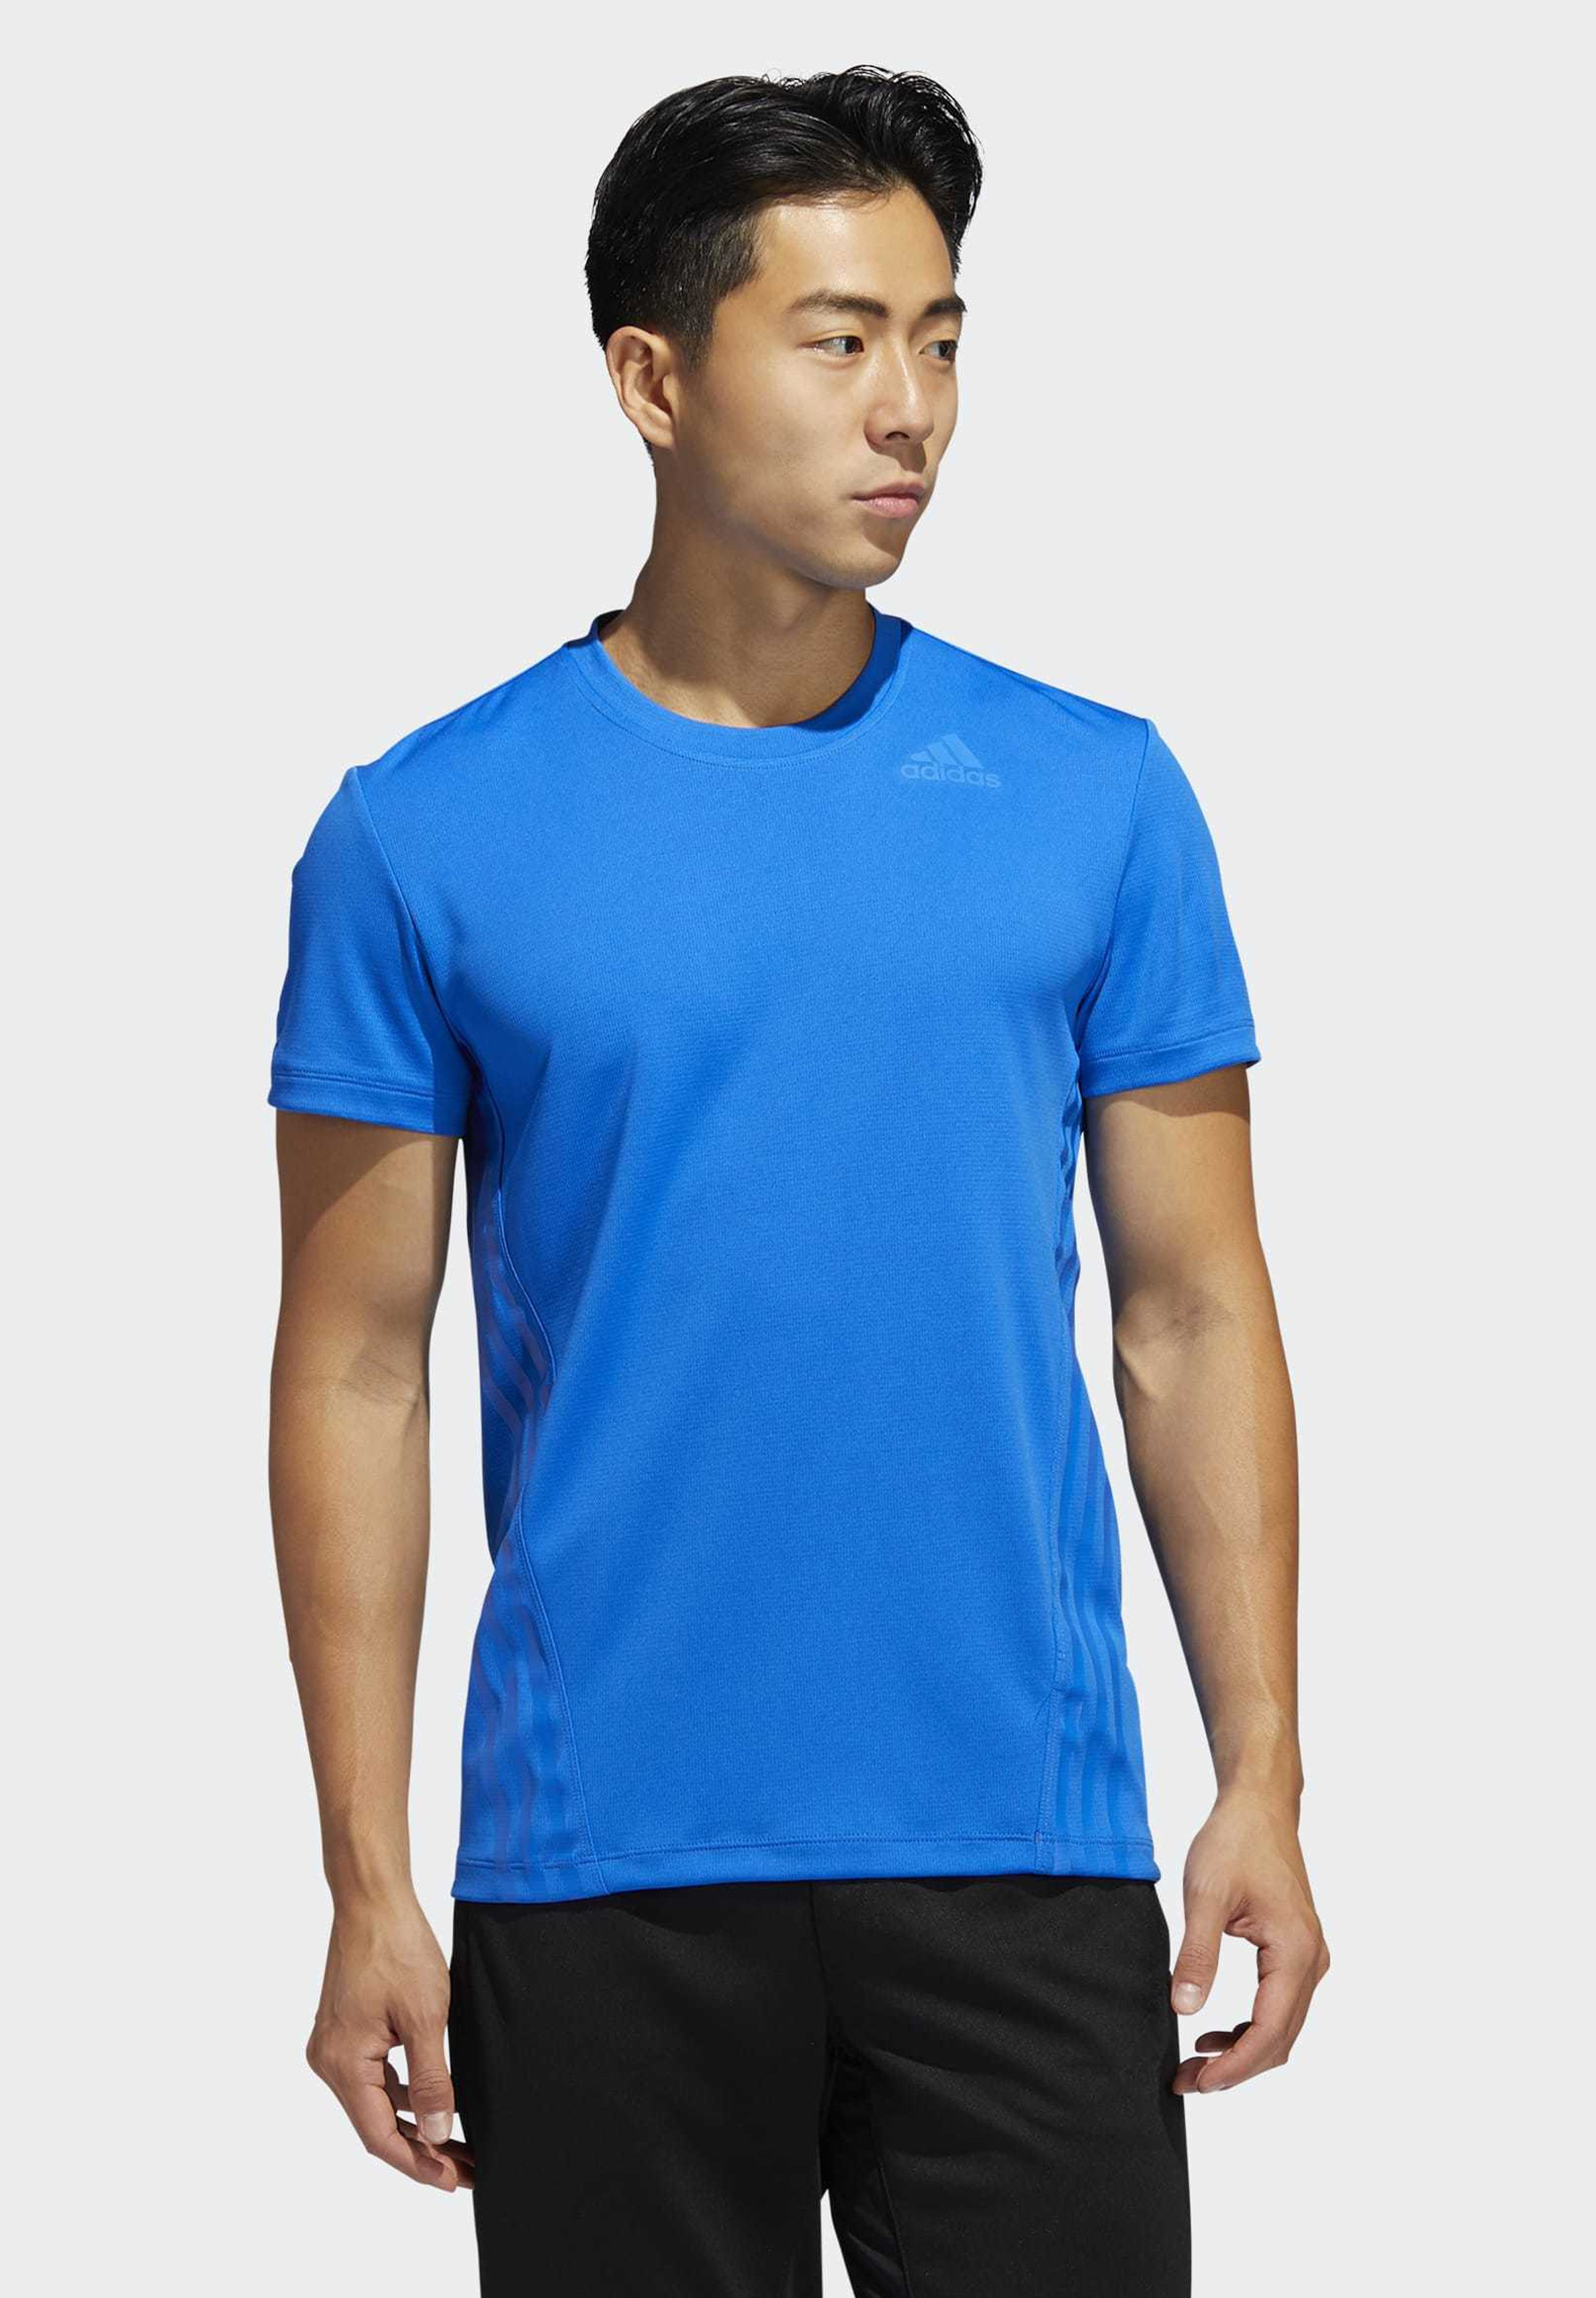 Adidas Performance Aeroready 3-stripes T-shirt - Med Print Blue QDCyHhF